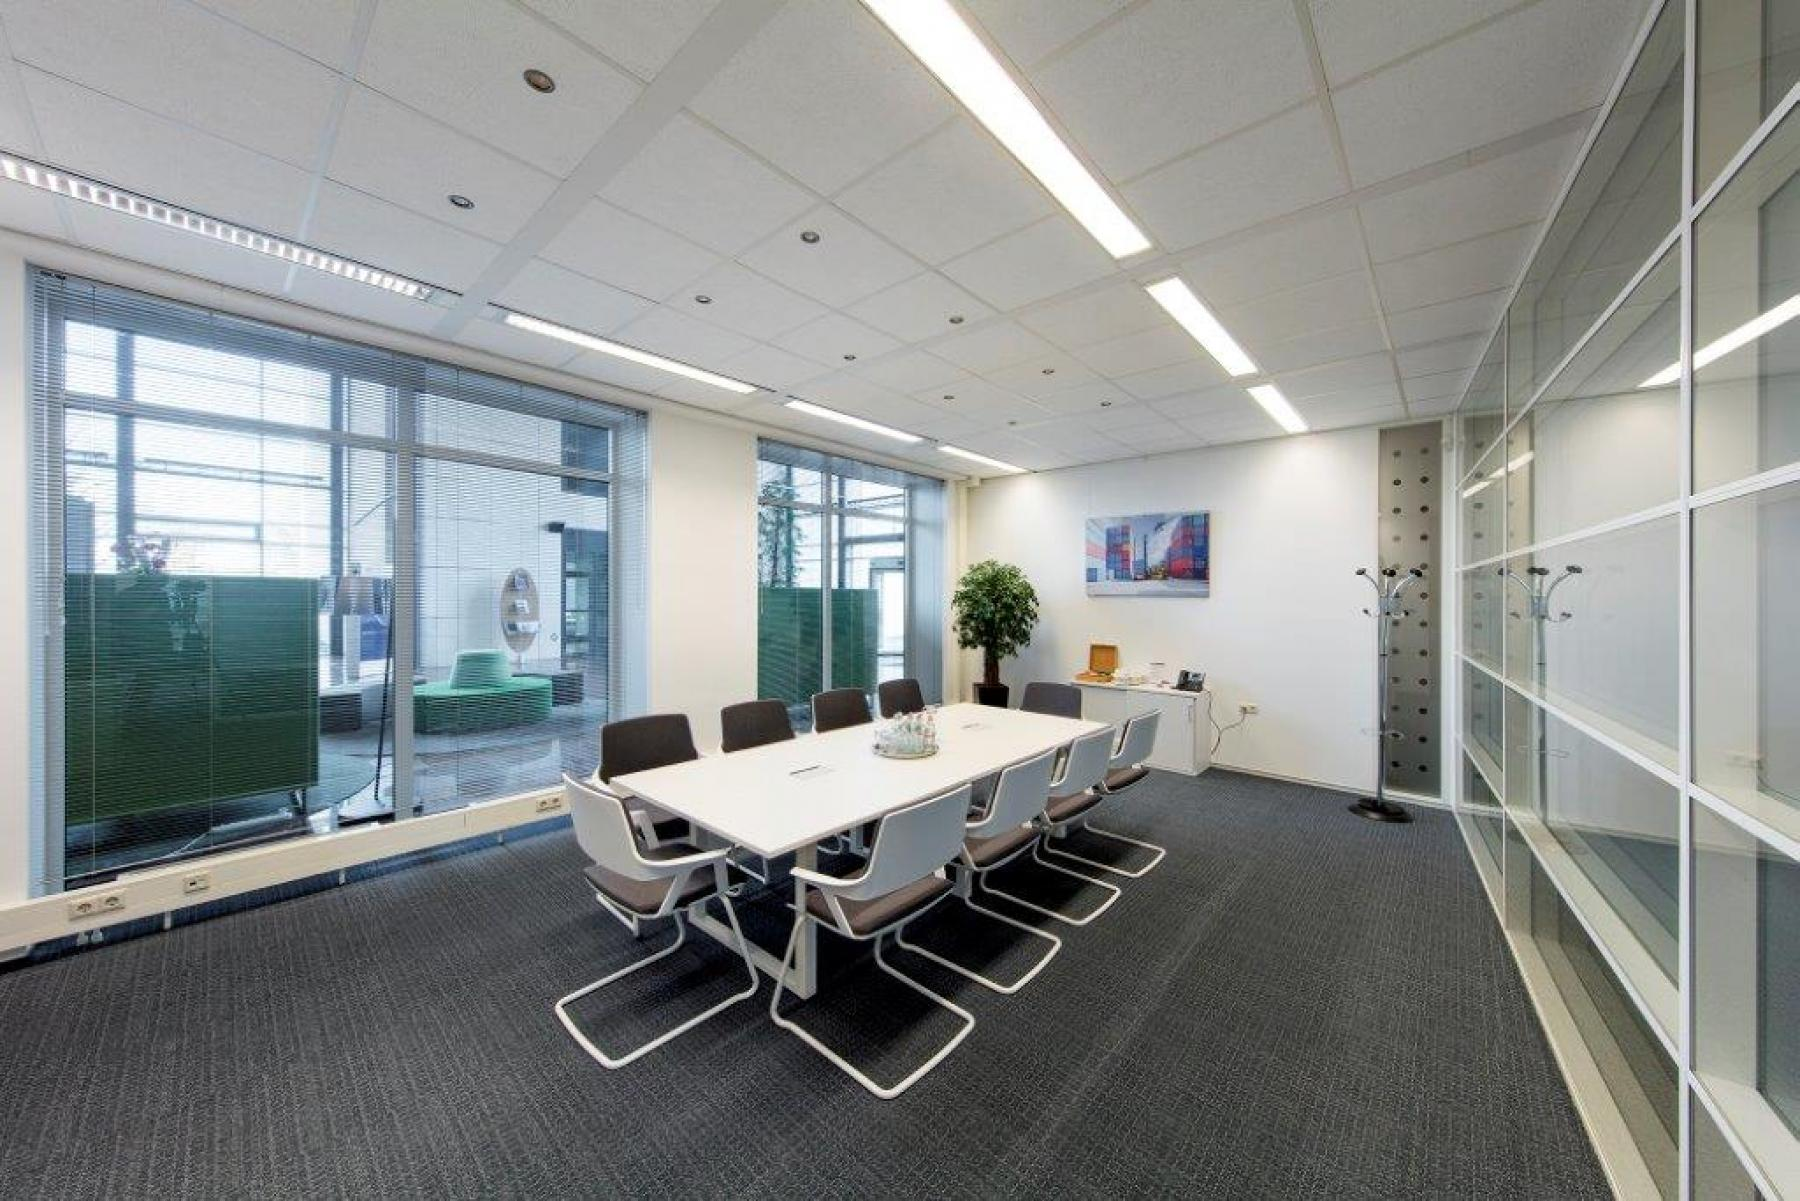 vergaderen presenteren schiphol kantoorruimte beech avenue huur kantoorruimte